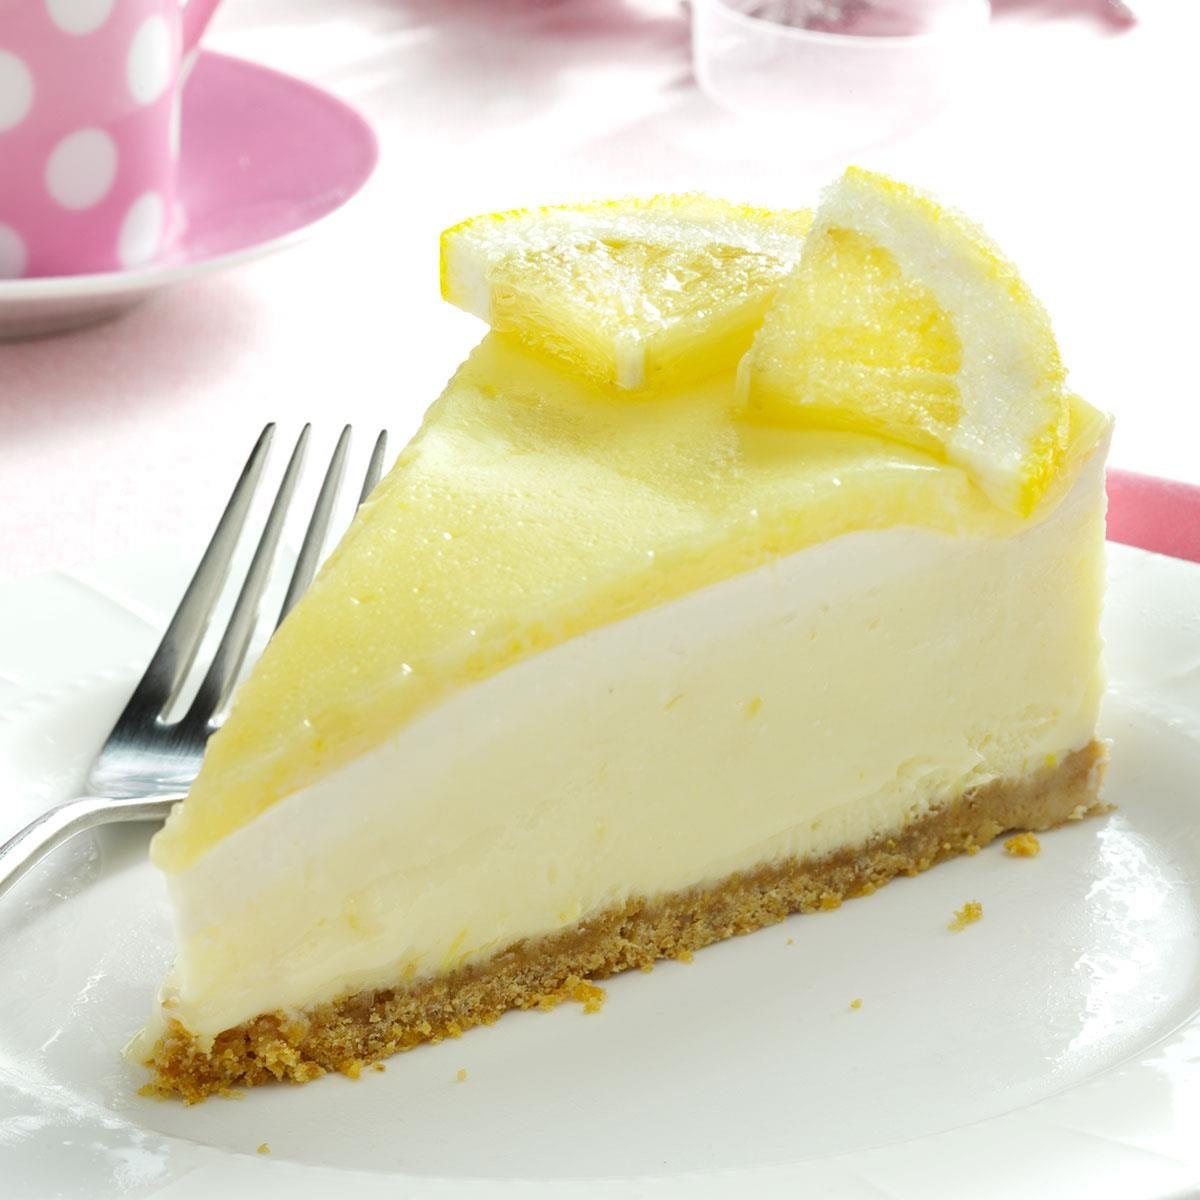 Creamy Lemon Cheesecake Recipe | Taste of Home